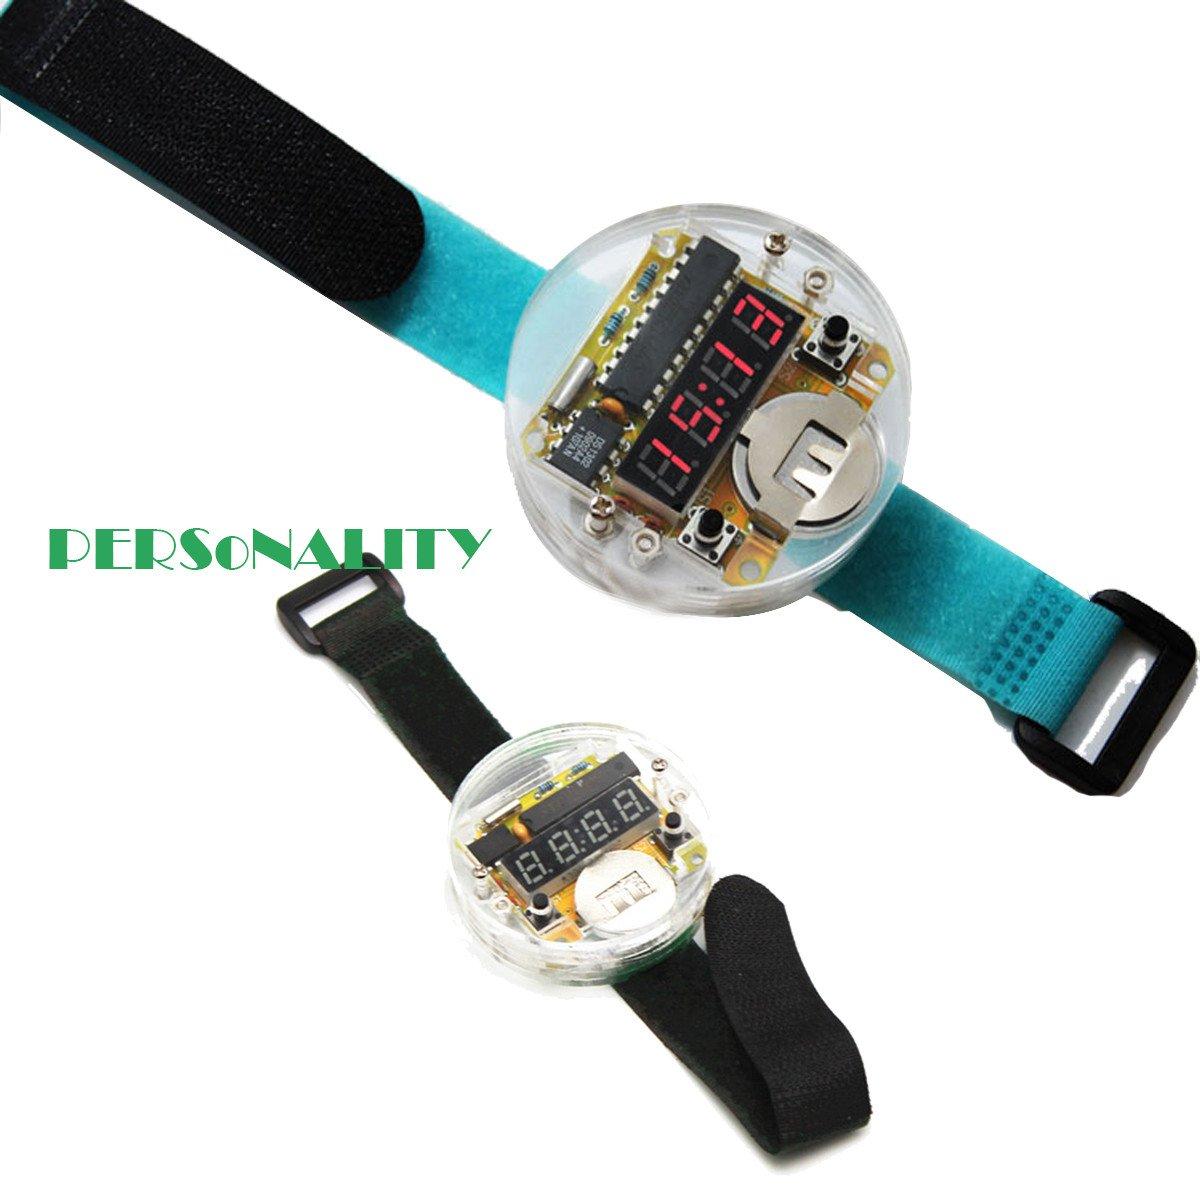 Nrthtri Module DIY 4-Digit Seven-Segment Display Digital Watch Kit W/Velcro Band - Translucent + Black by Nrthtri